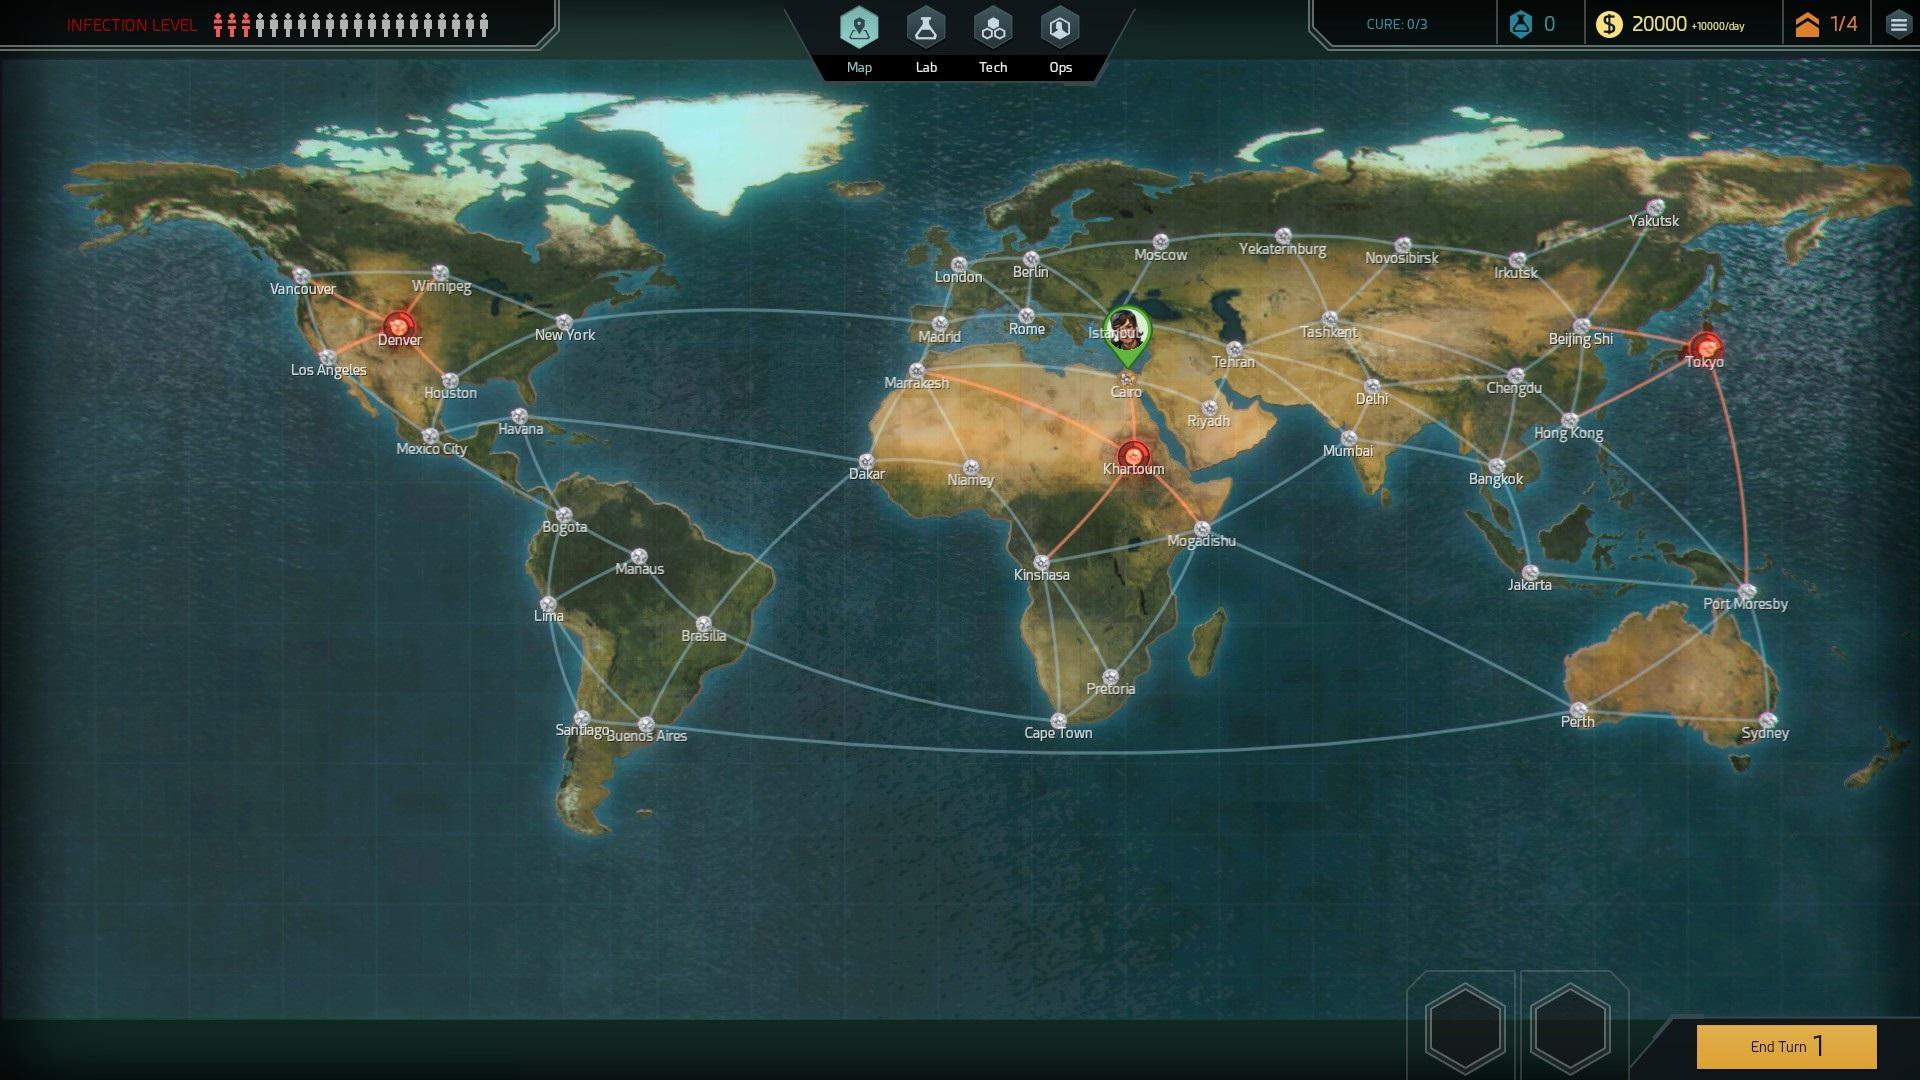 Quarantine Screenshot 1